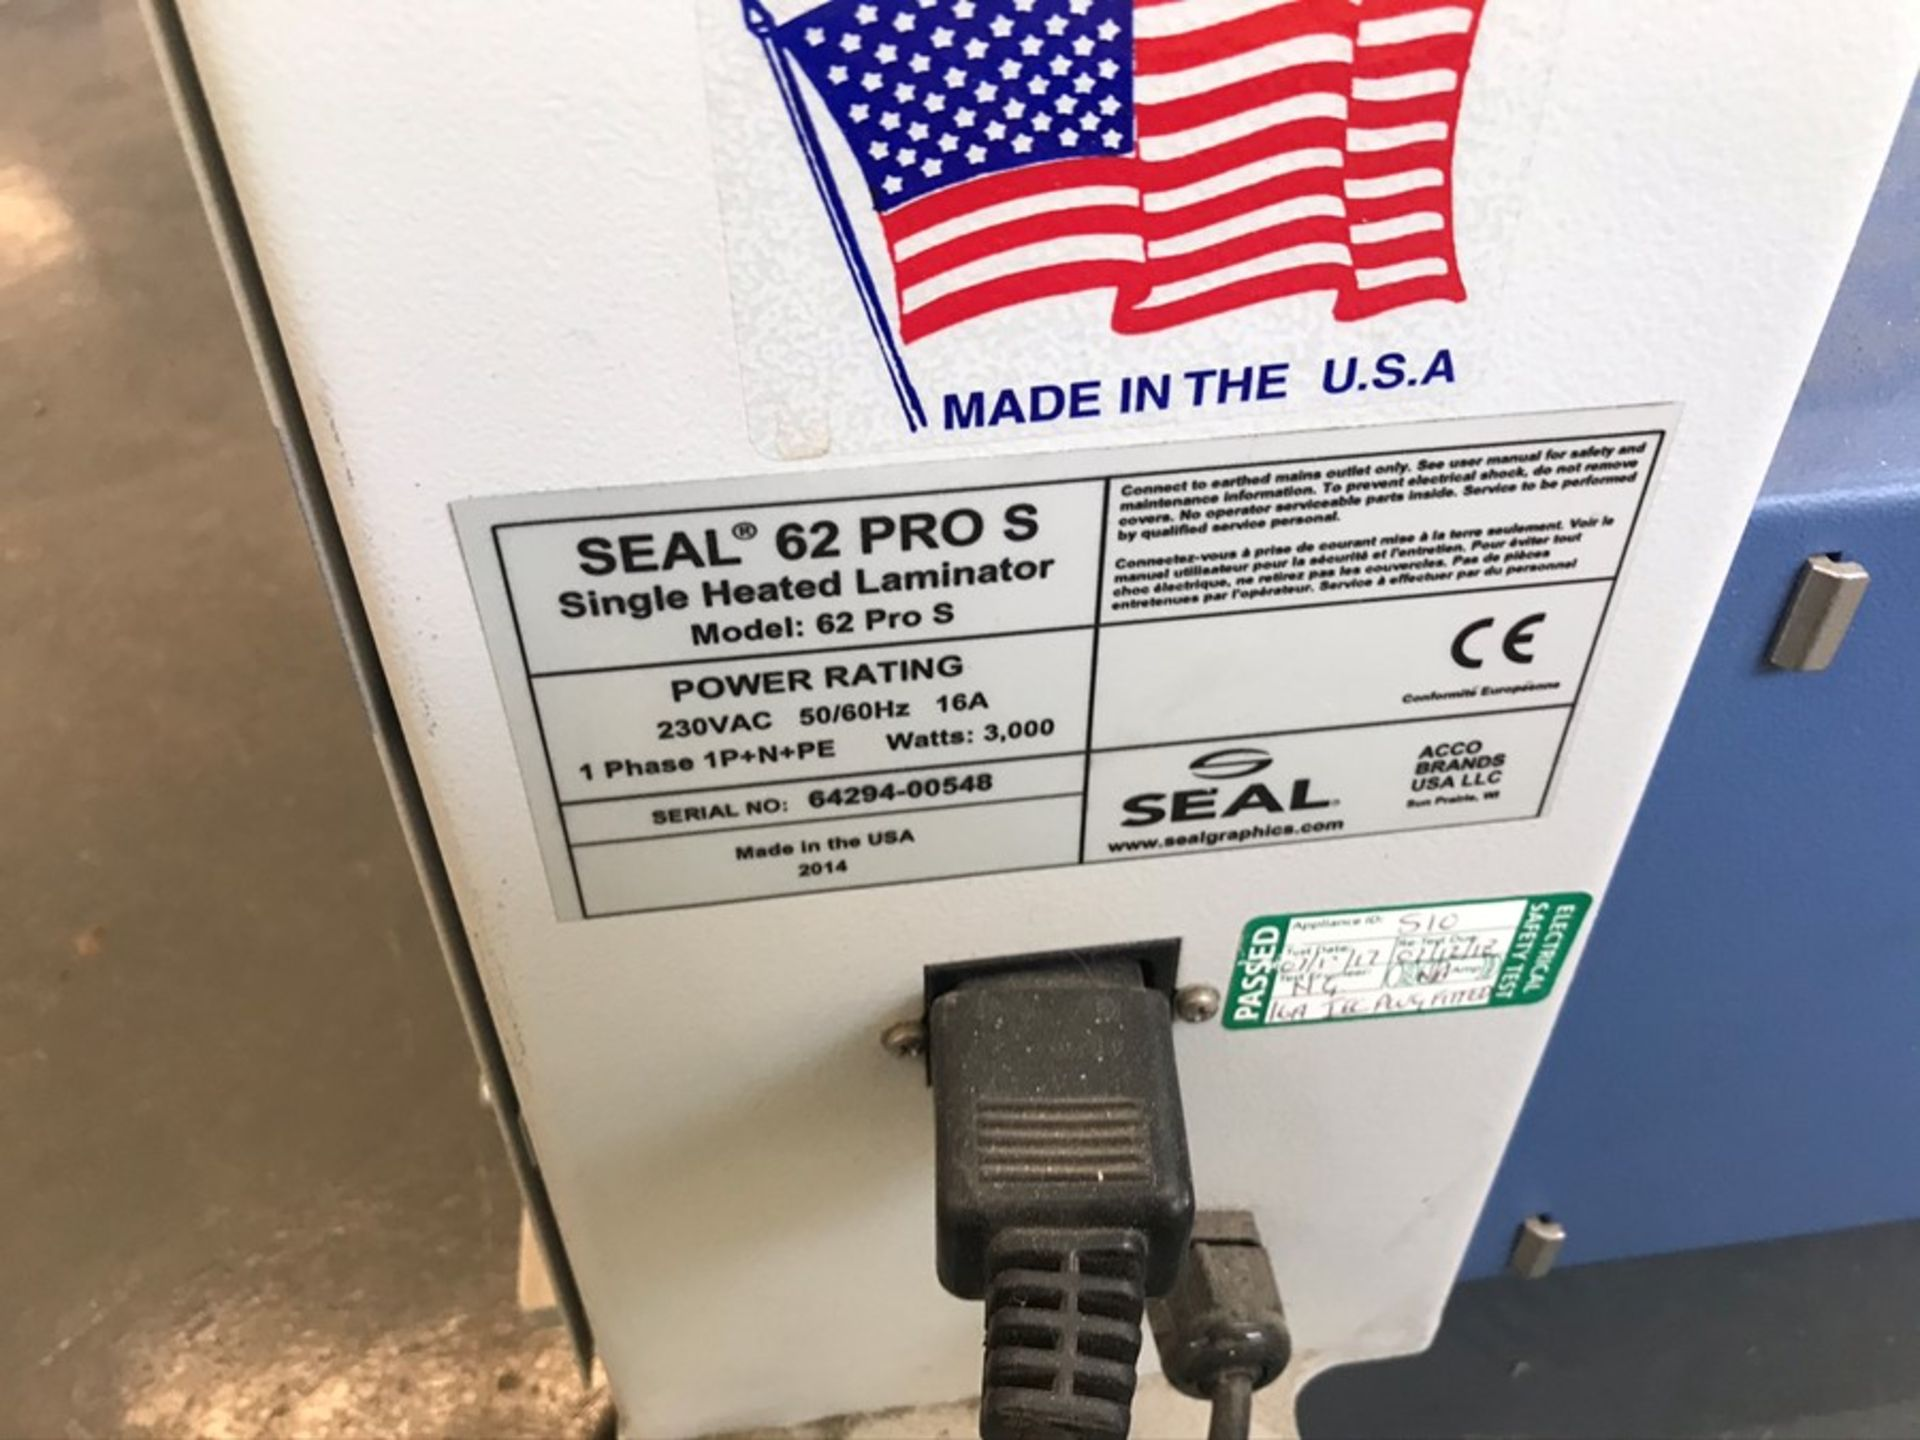 Seal 62S single heated laminator (2014) - Image 5 of 7